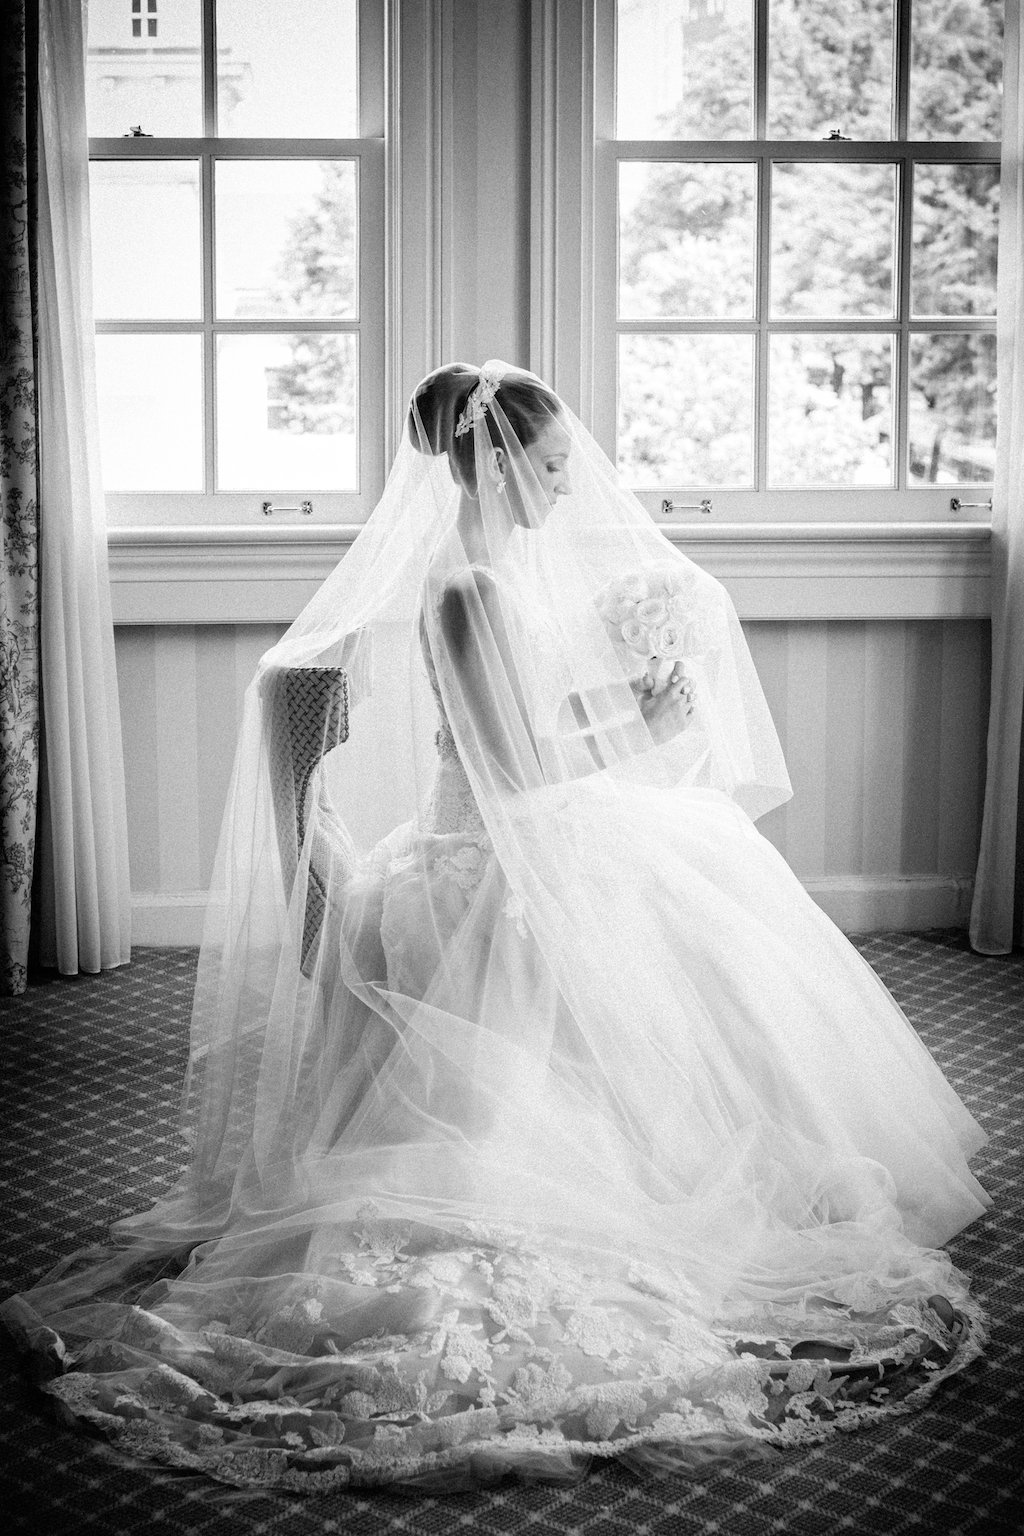 2-8-16-glam-andrew-mellon-gold-wedding-1new